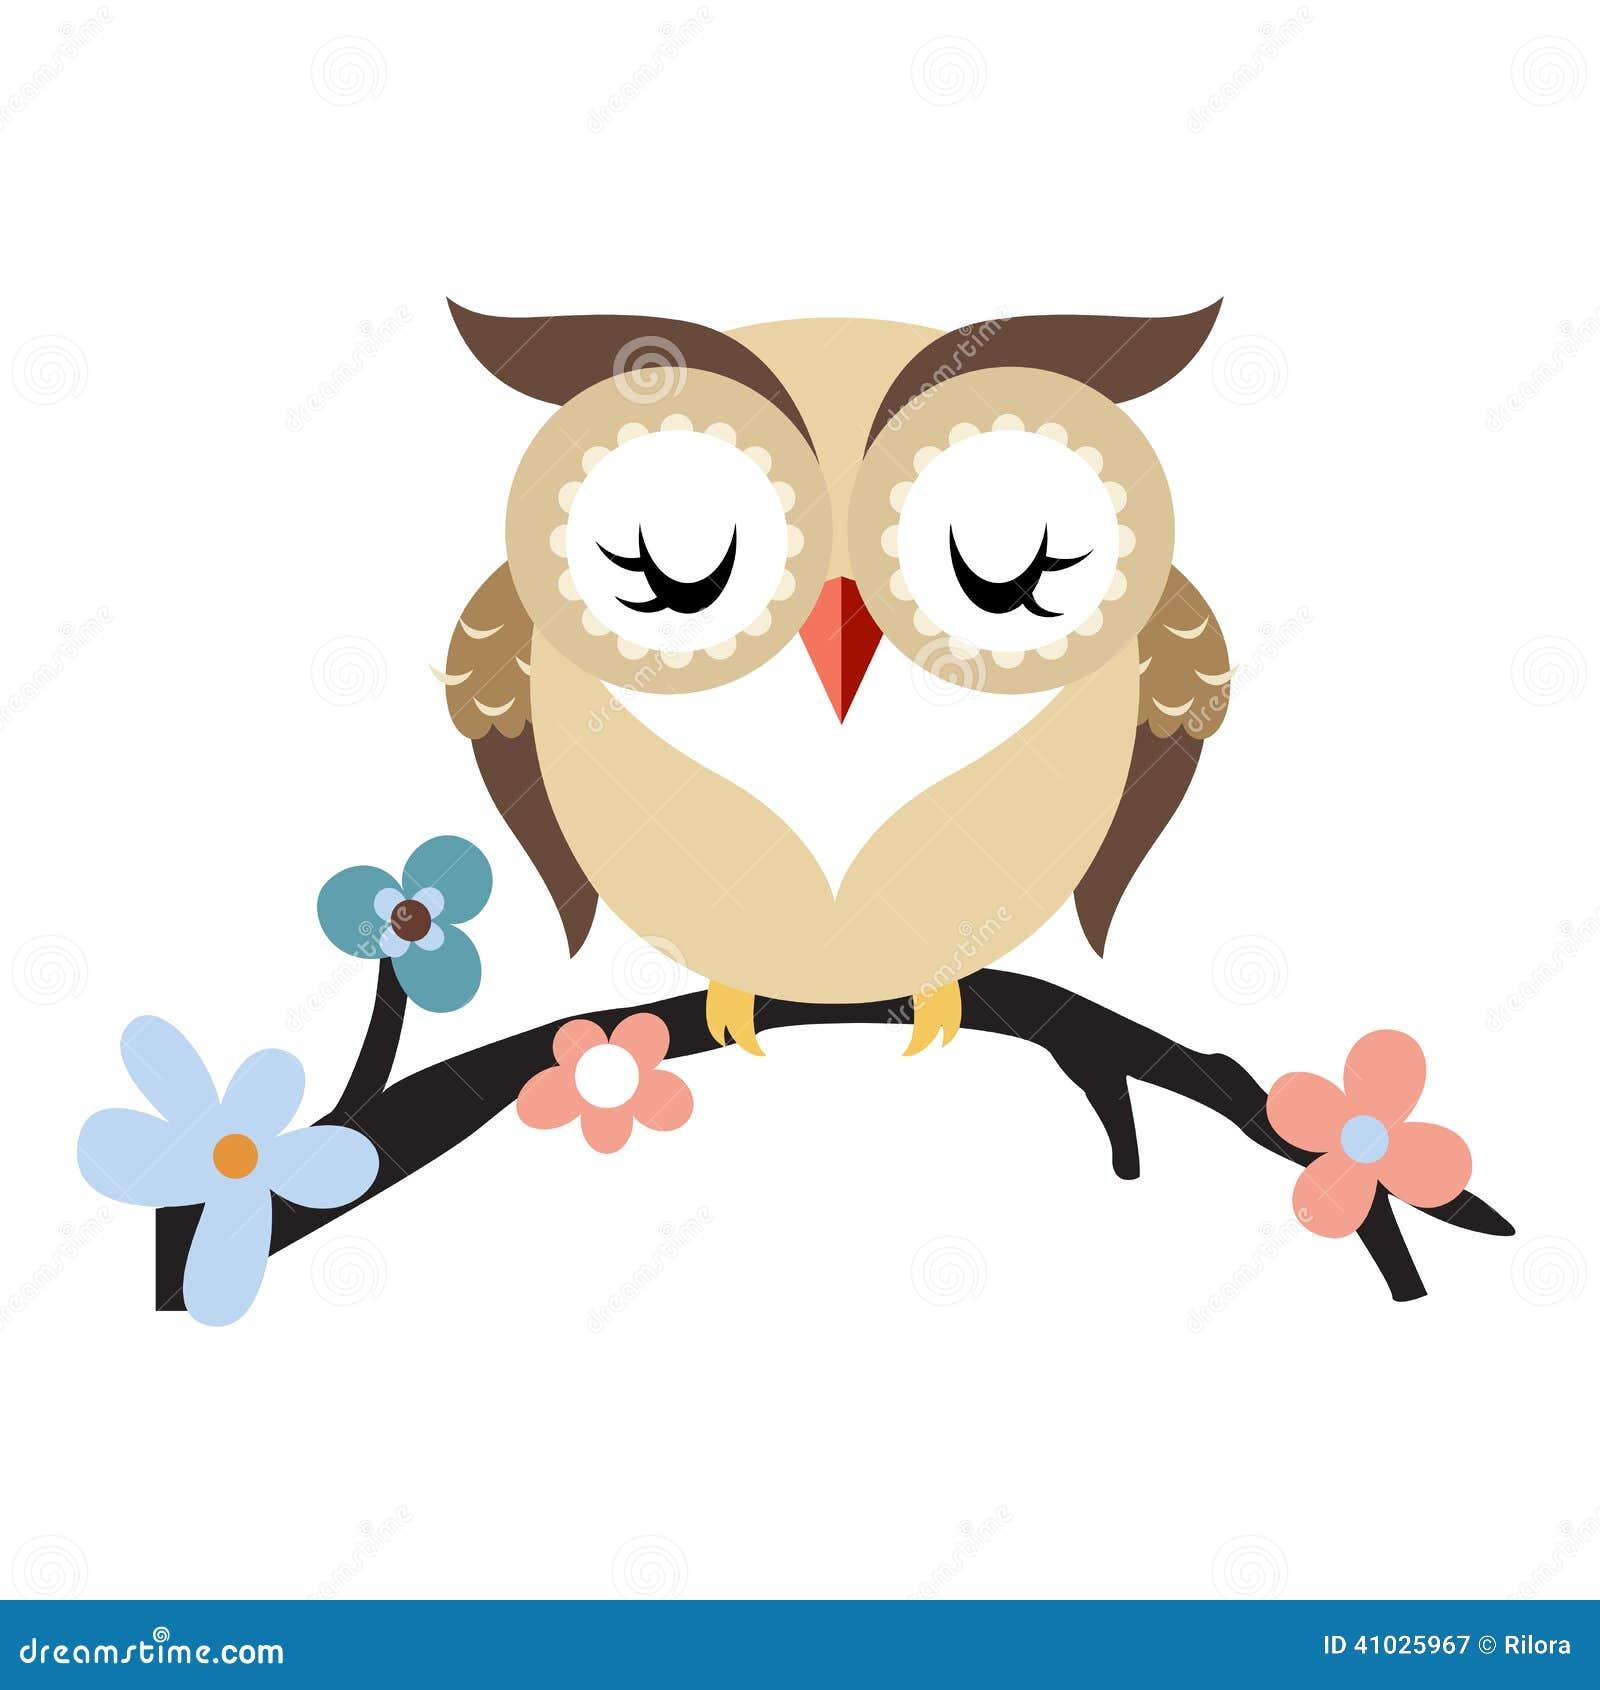 Cute cartoon owls on a branch - photo#19